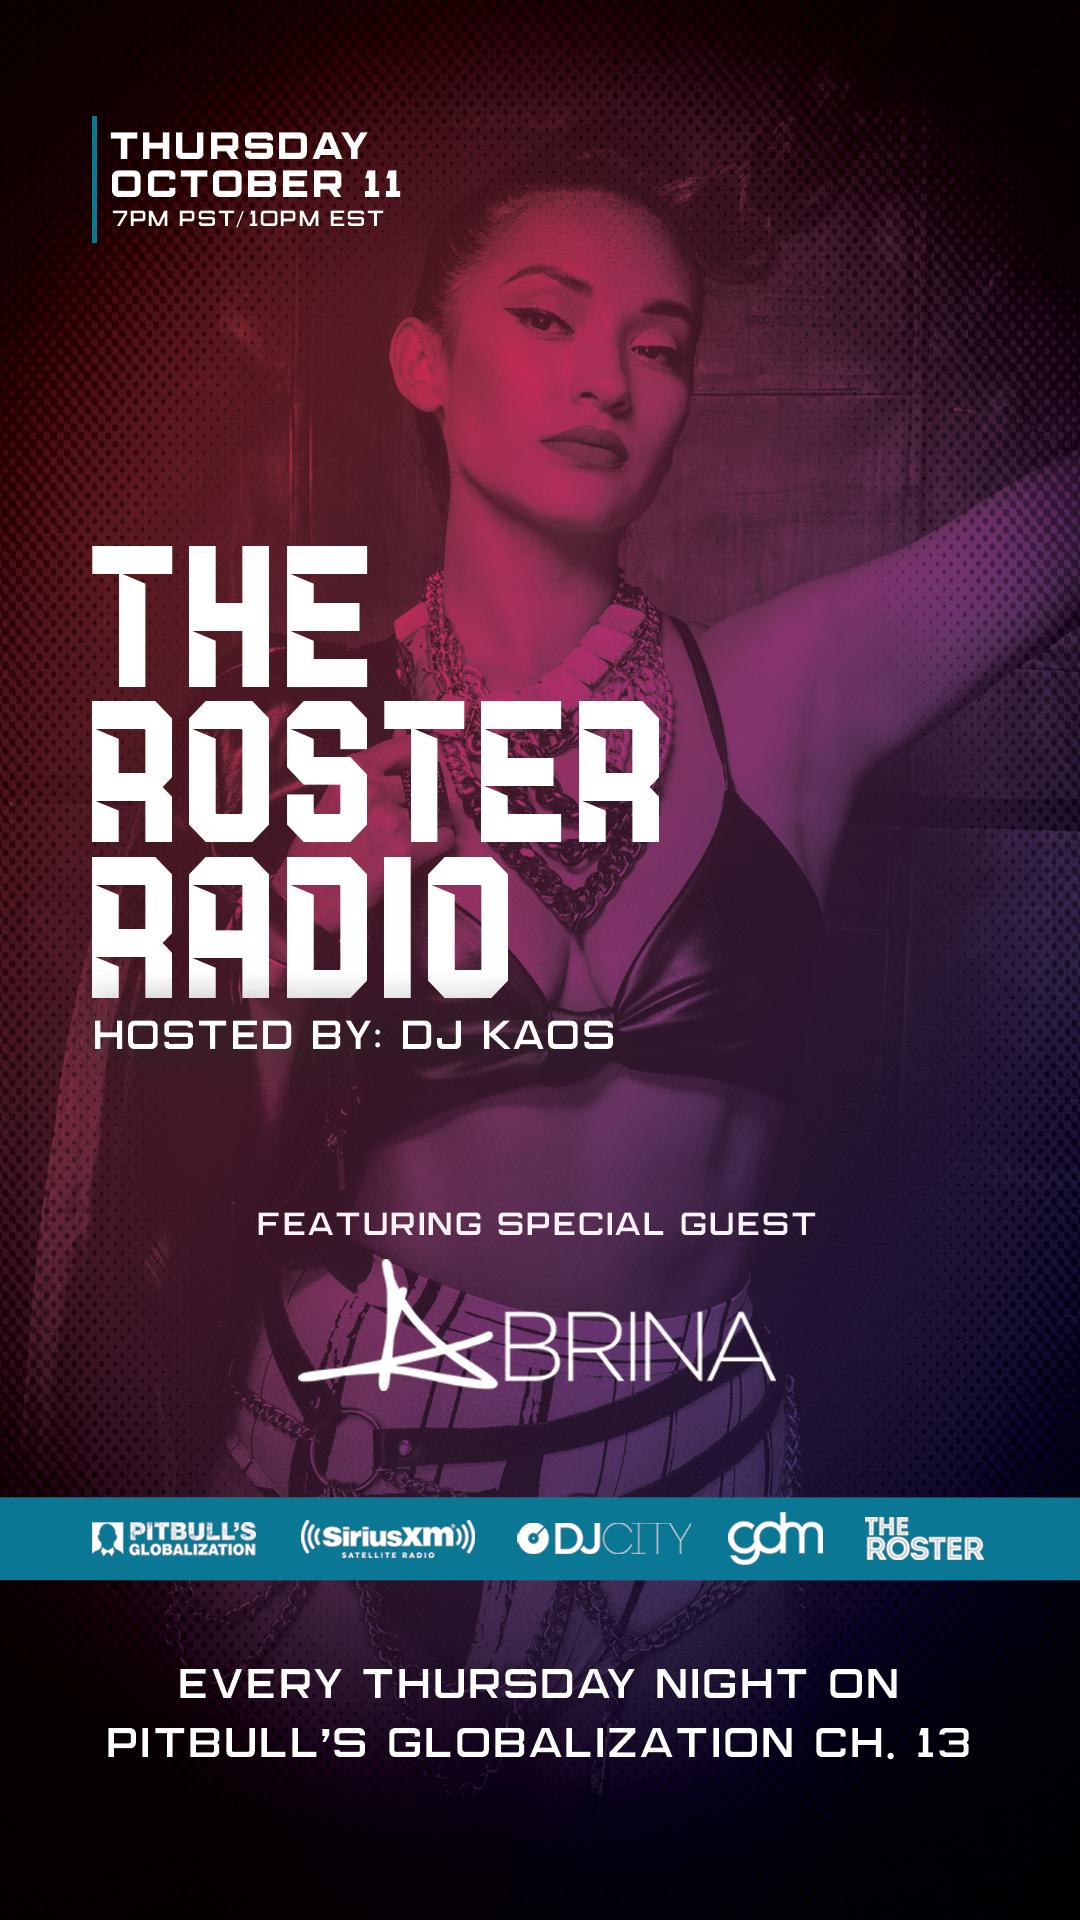 TheRosterRadio-101118-Abrina-MainFlyer-IG.jpg